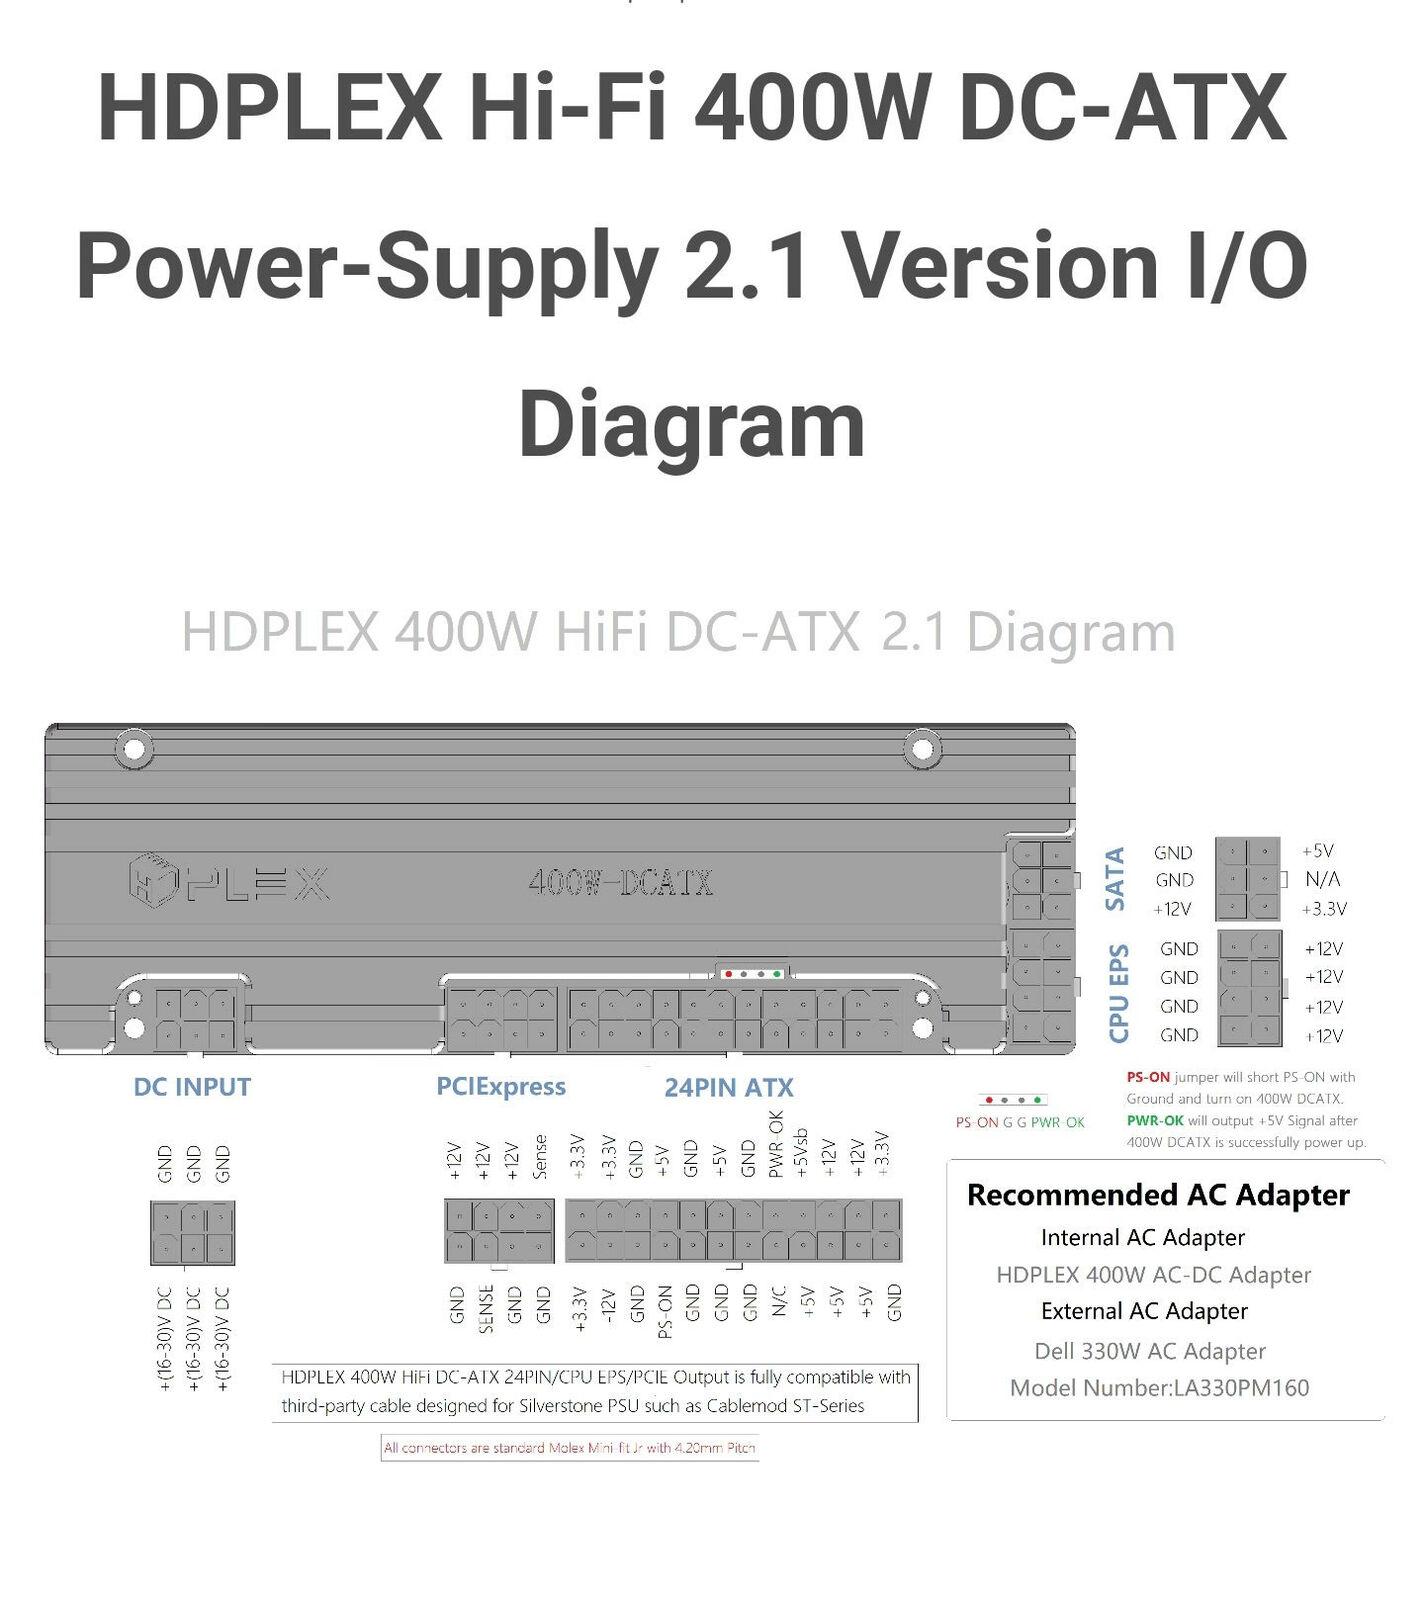 HDPLEX Hi-Fi 2.1 Version